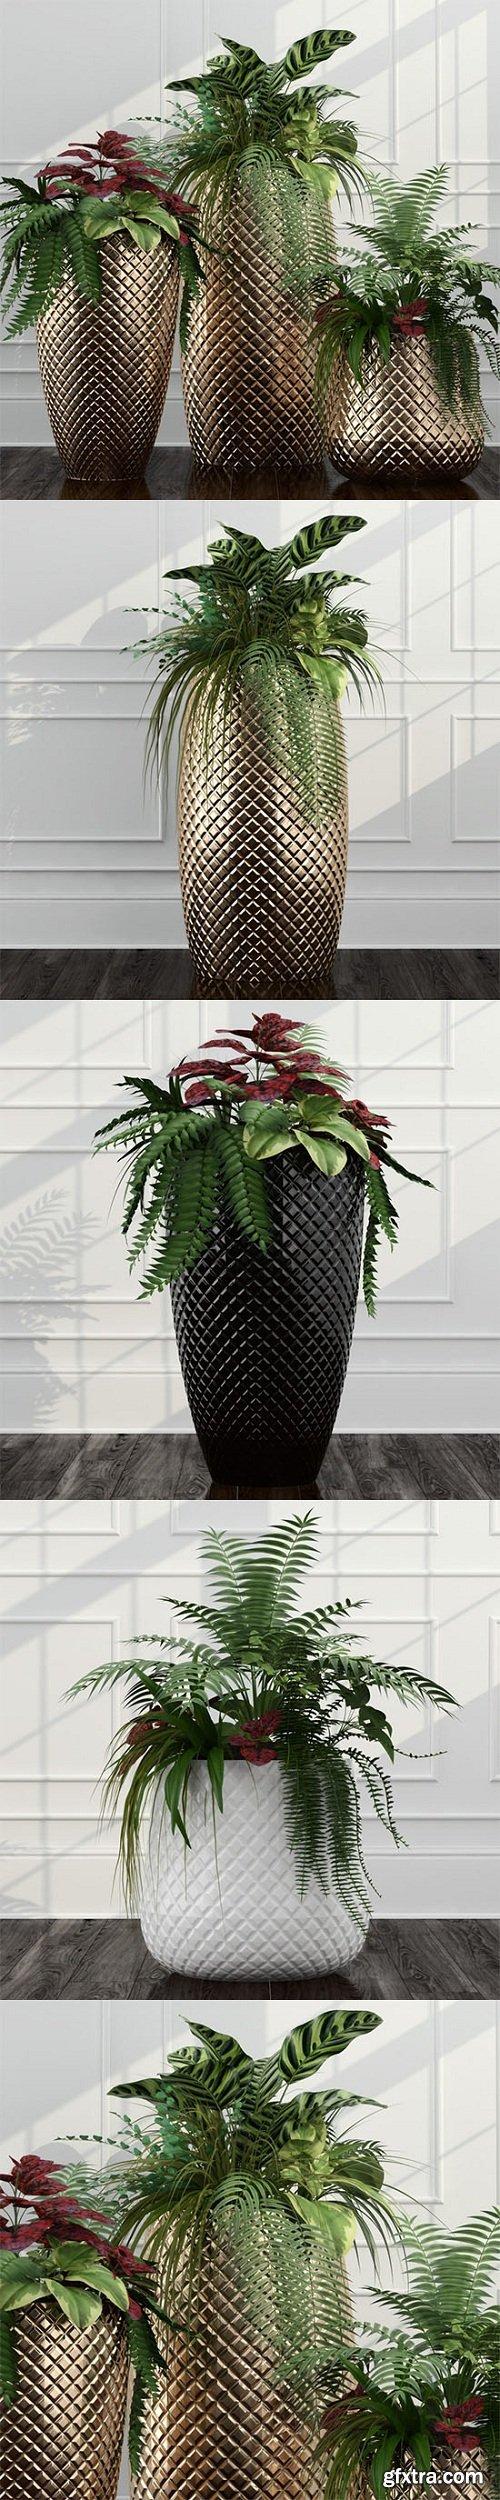 Room plants 11